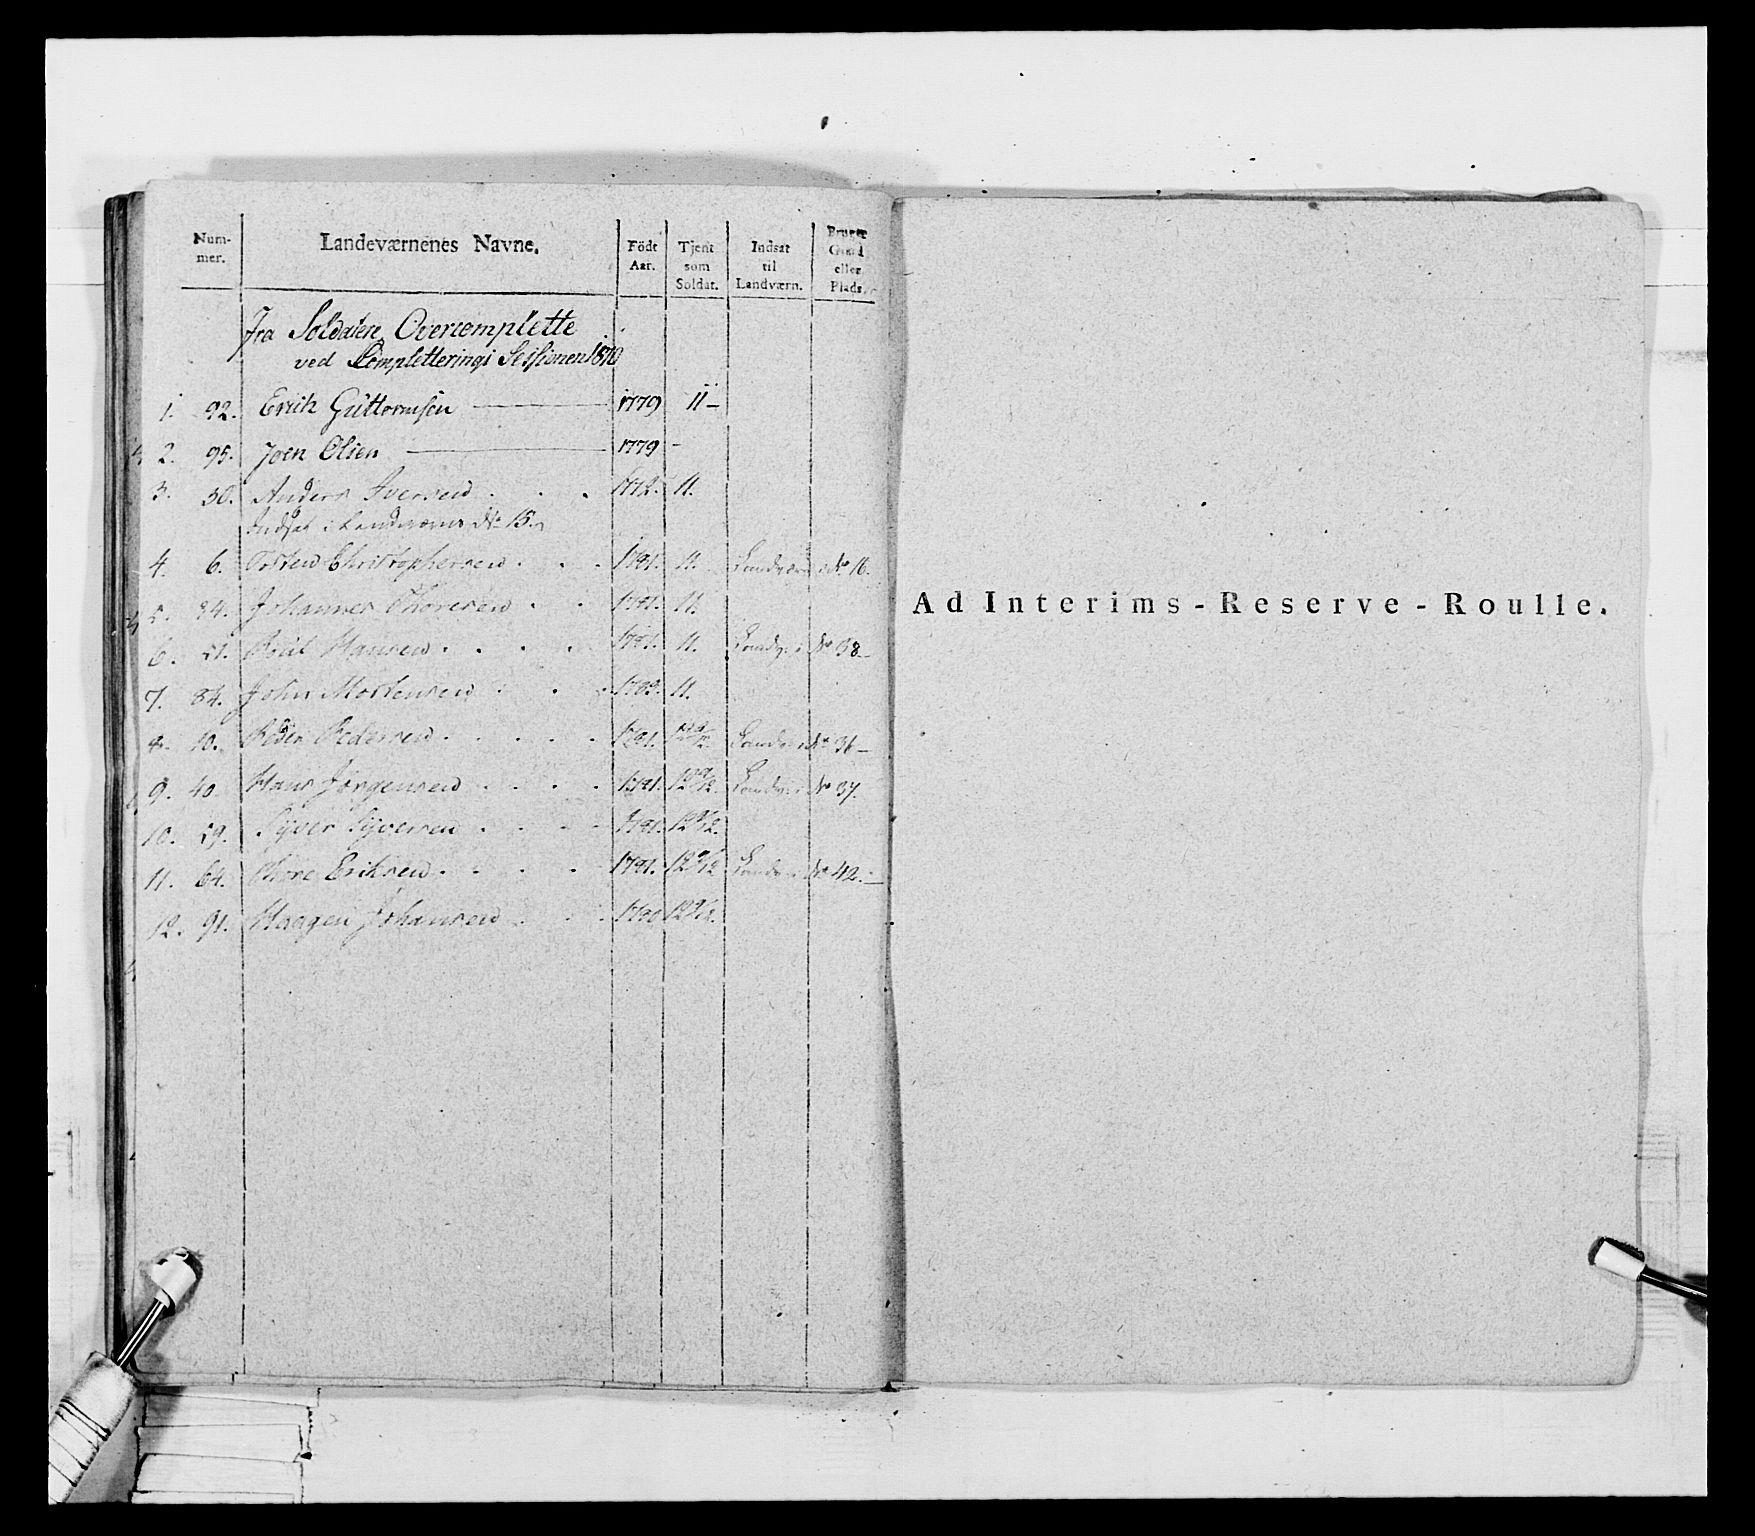 RA, Generalitets- og kommissariatskollegiet, Det kongelige norske kommissariatskollegium, E/Eh/L0069: Opplandske gevorbne infanteriregiment, 1810-1818, s. 304